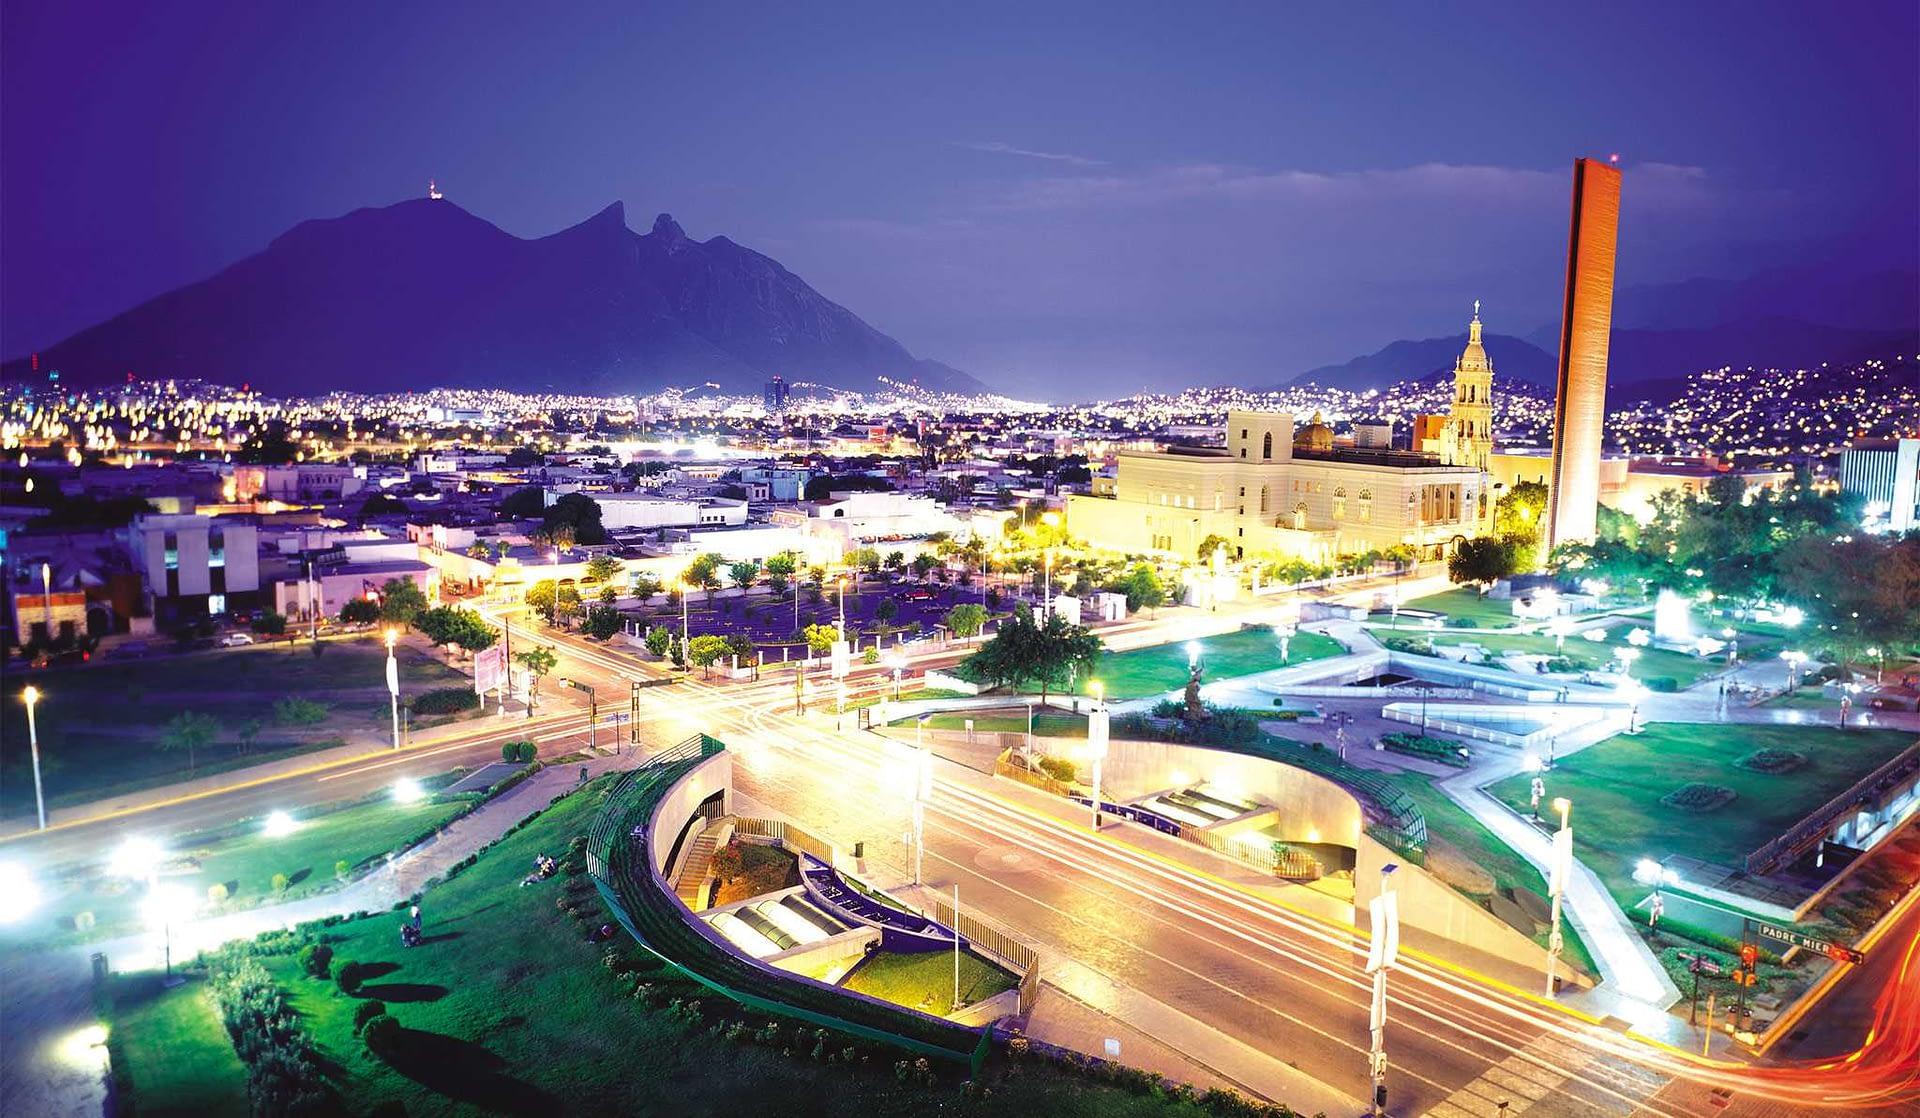 Nuevo Leon's economy grew 4.2% during the beginning of 2019